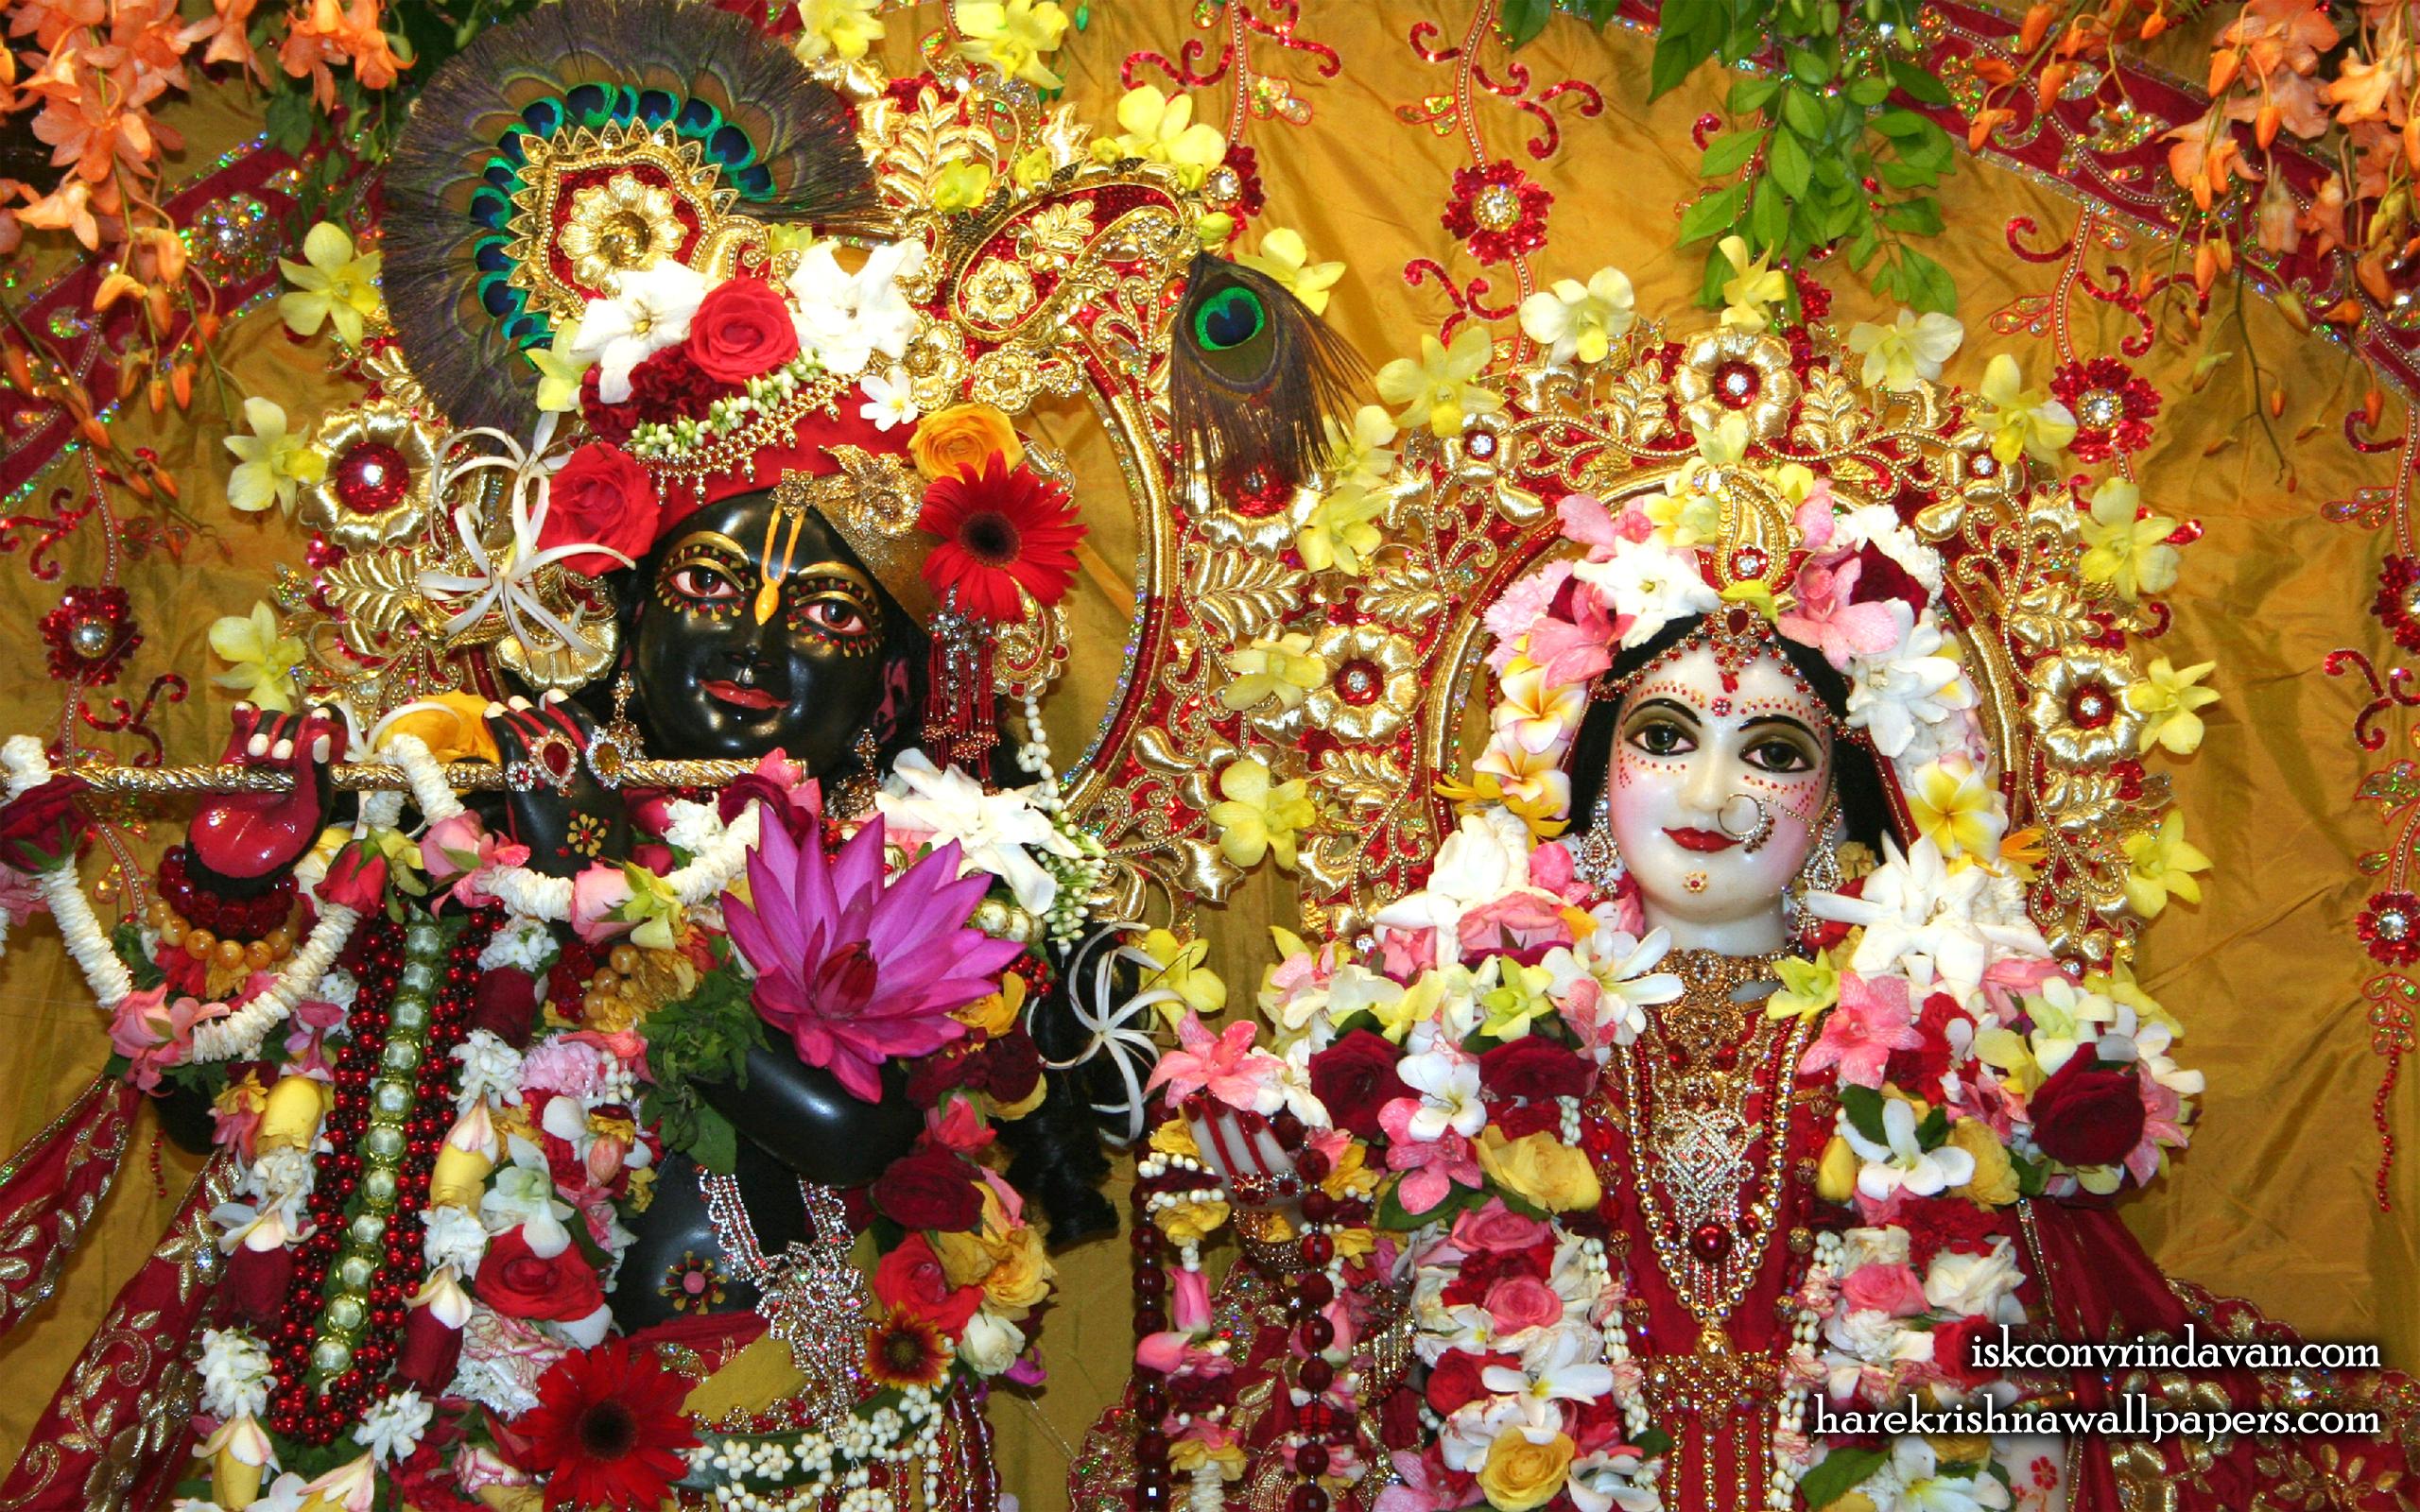 Sri Sri Radha Shyamsundar Close up Wallpaper (004) Size 2560x1600 Download